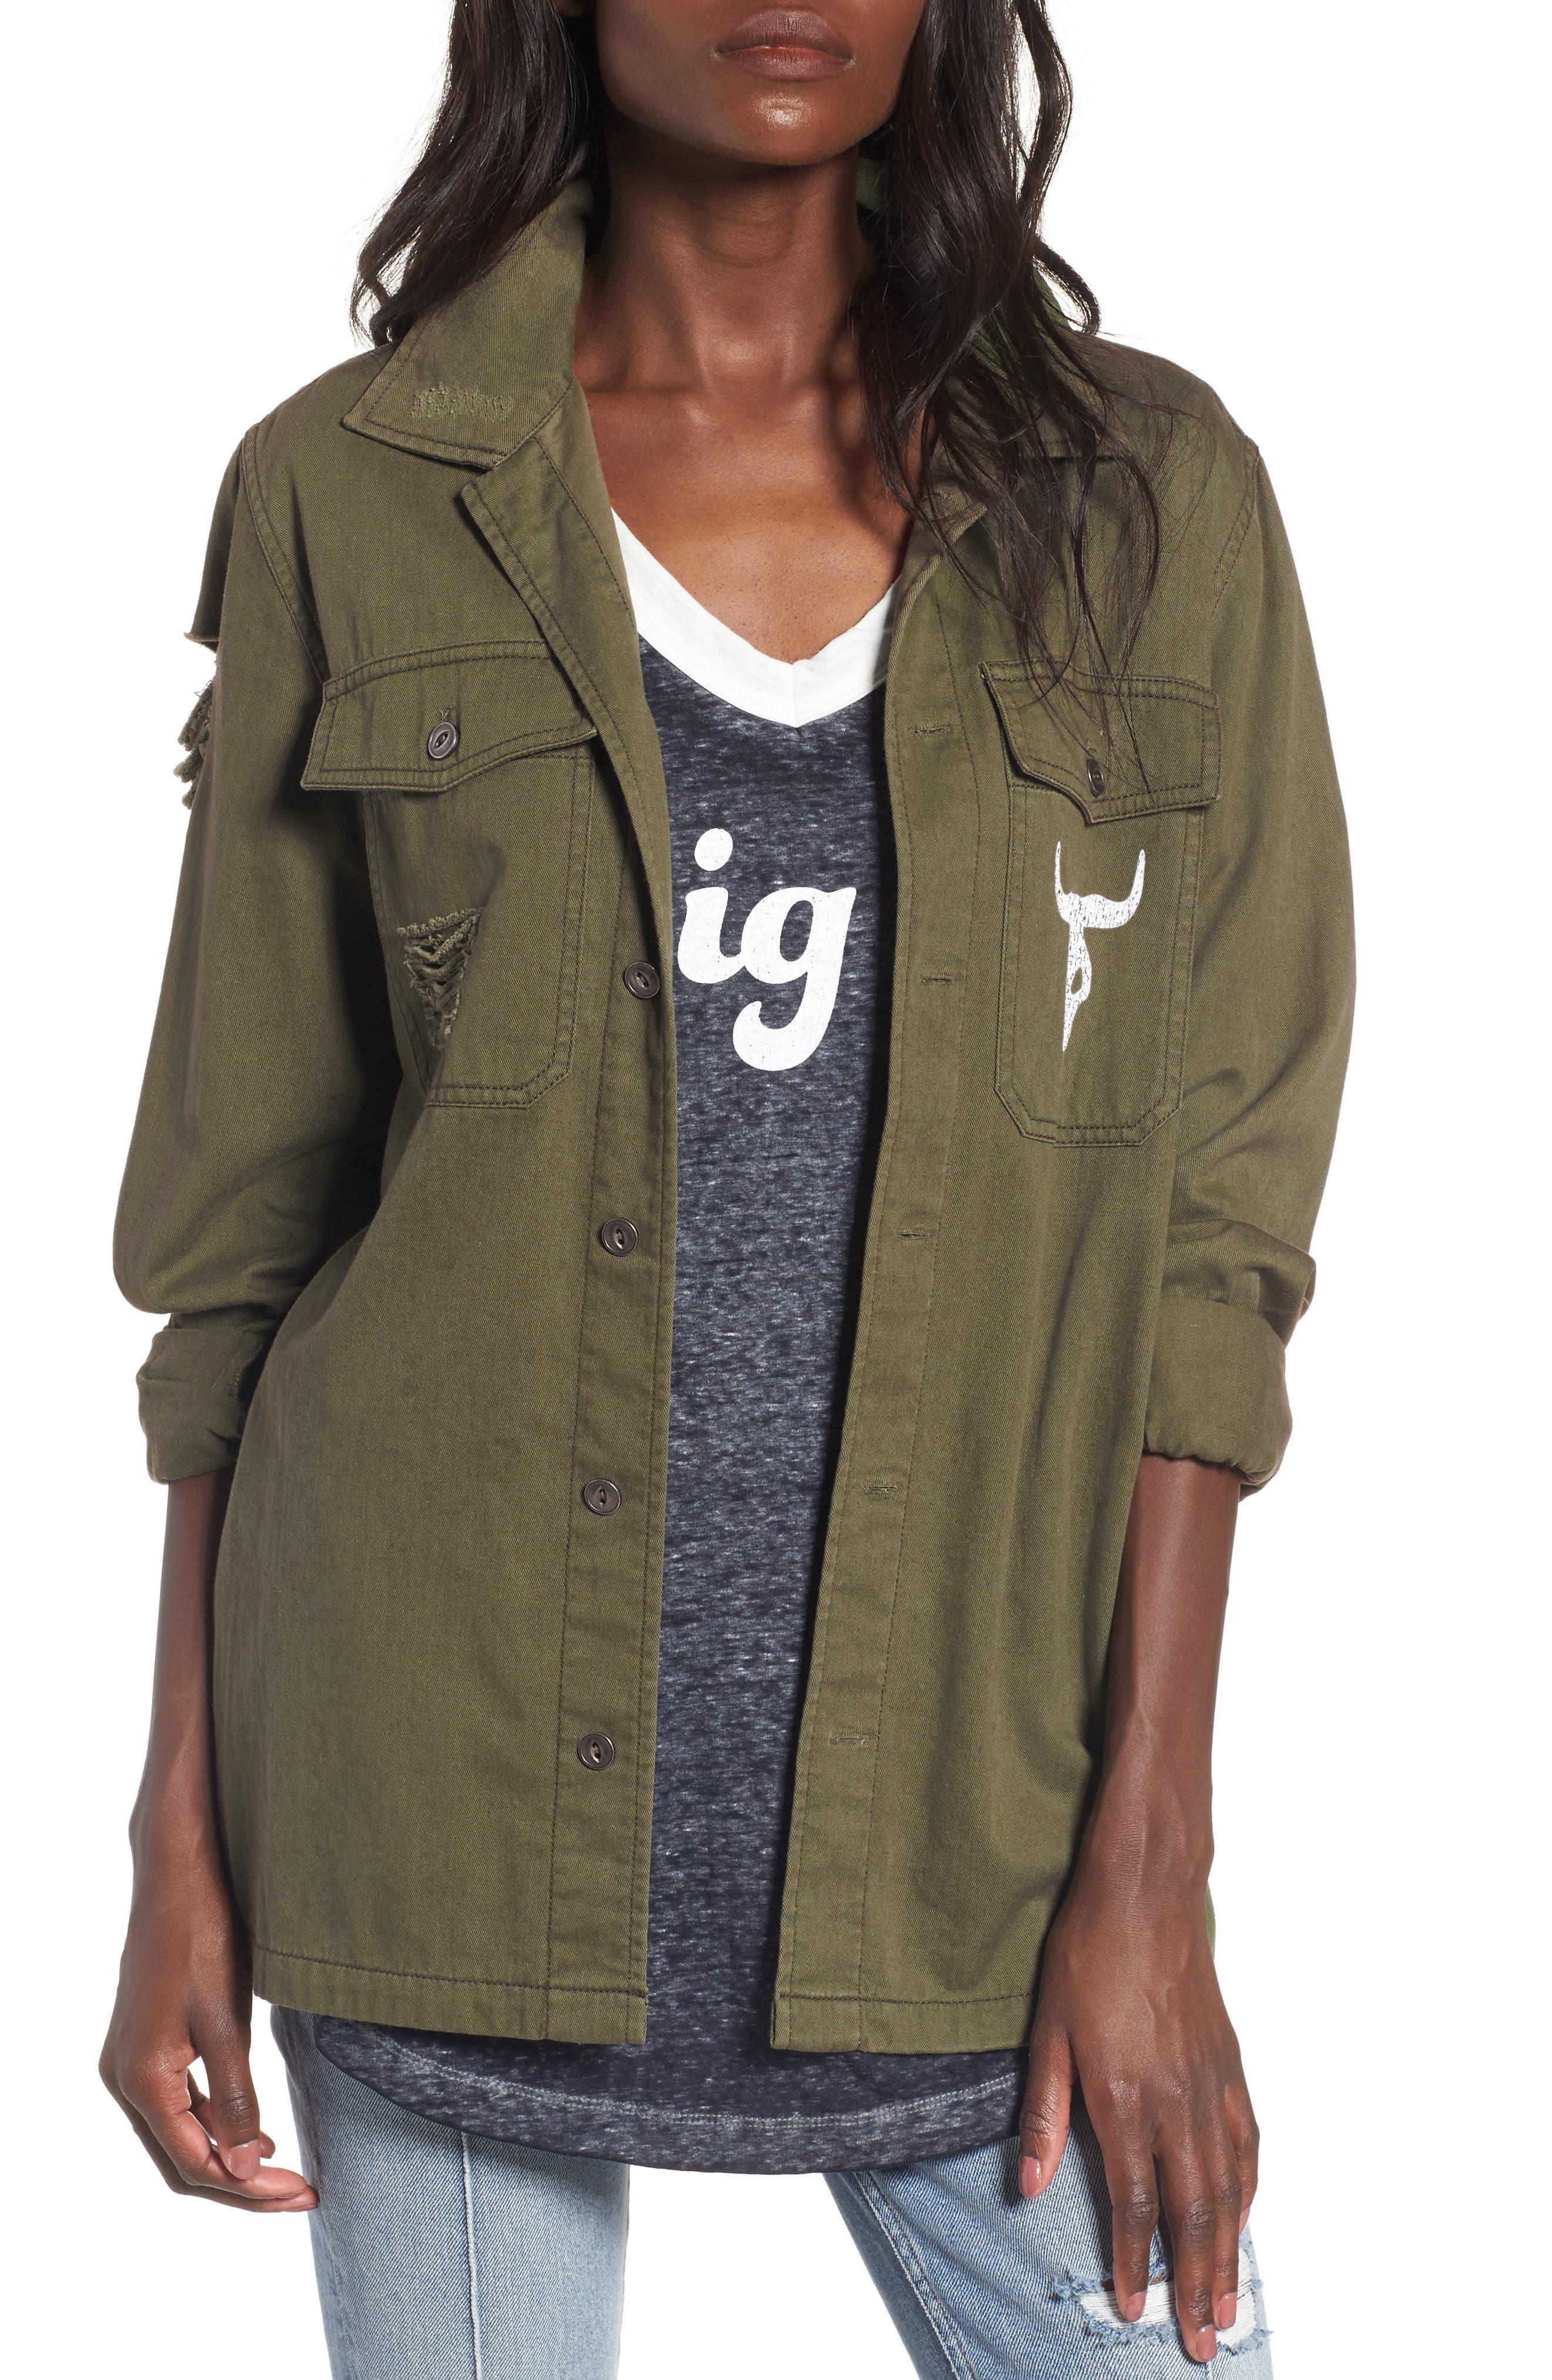 Main Image - Show Me Your Mumu Army Jacket